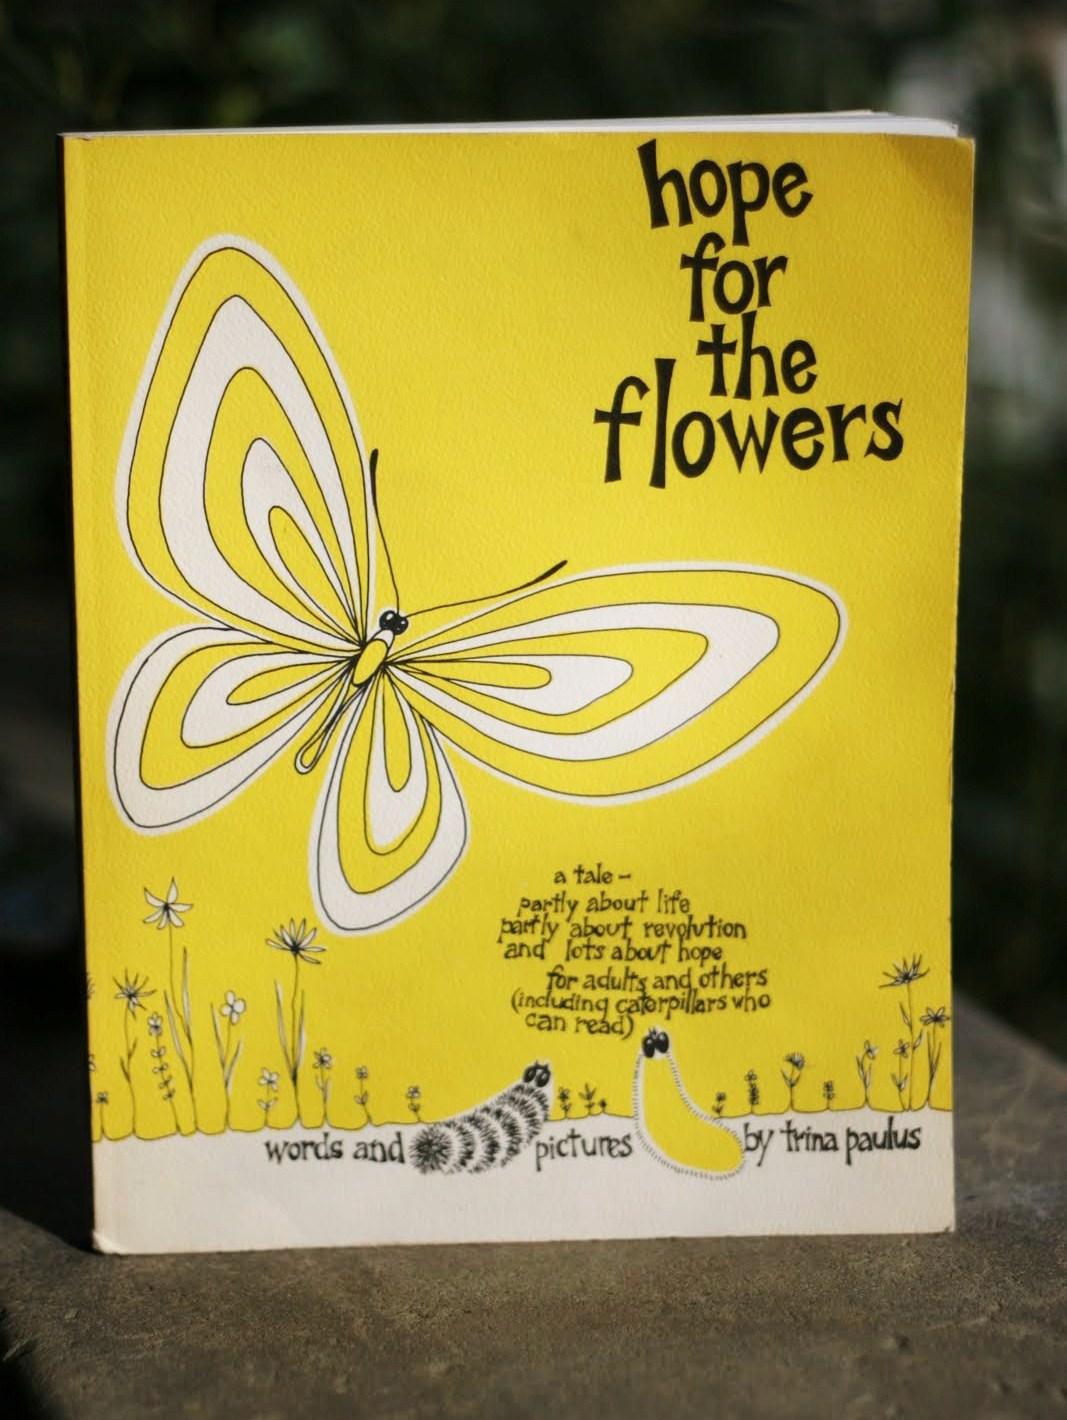 hope for the flowers a Flowers of hope (希望の花 kibō no hana viz: the blossom of hope) is chapter 449 of the original naruto manga to help naruto bring peace to the world.